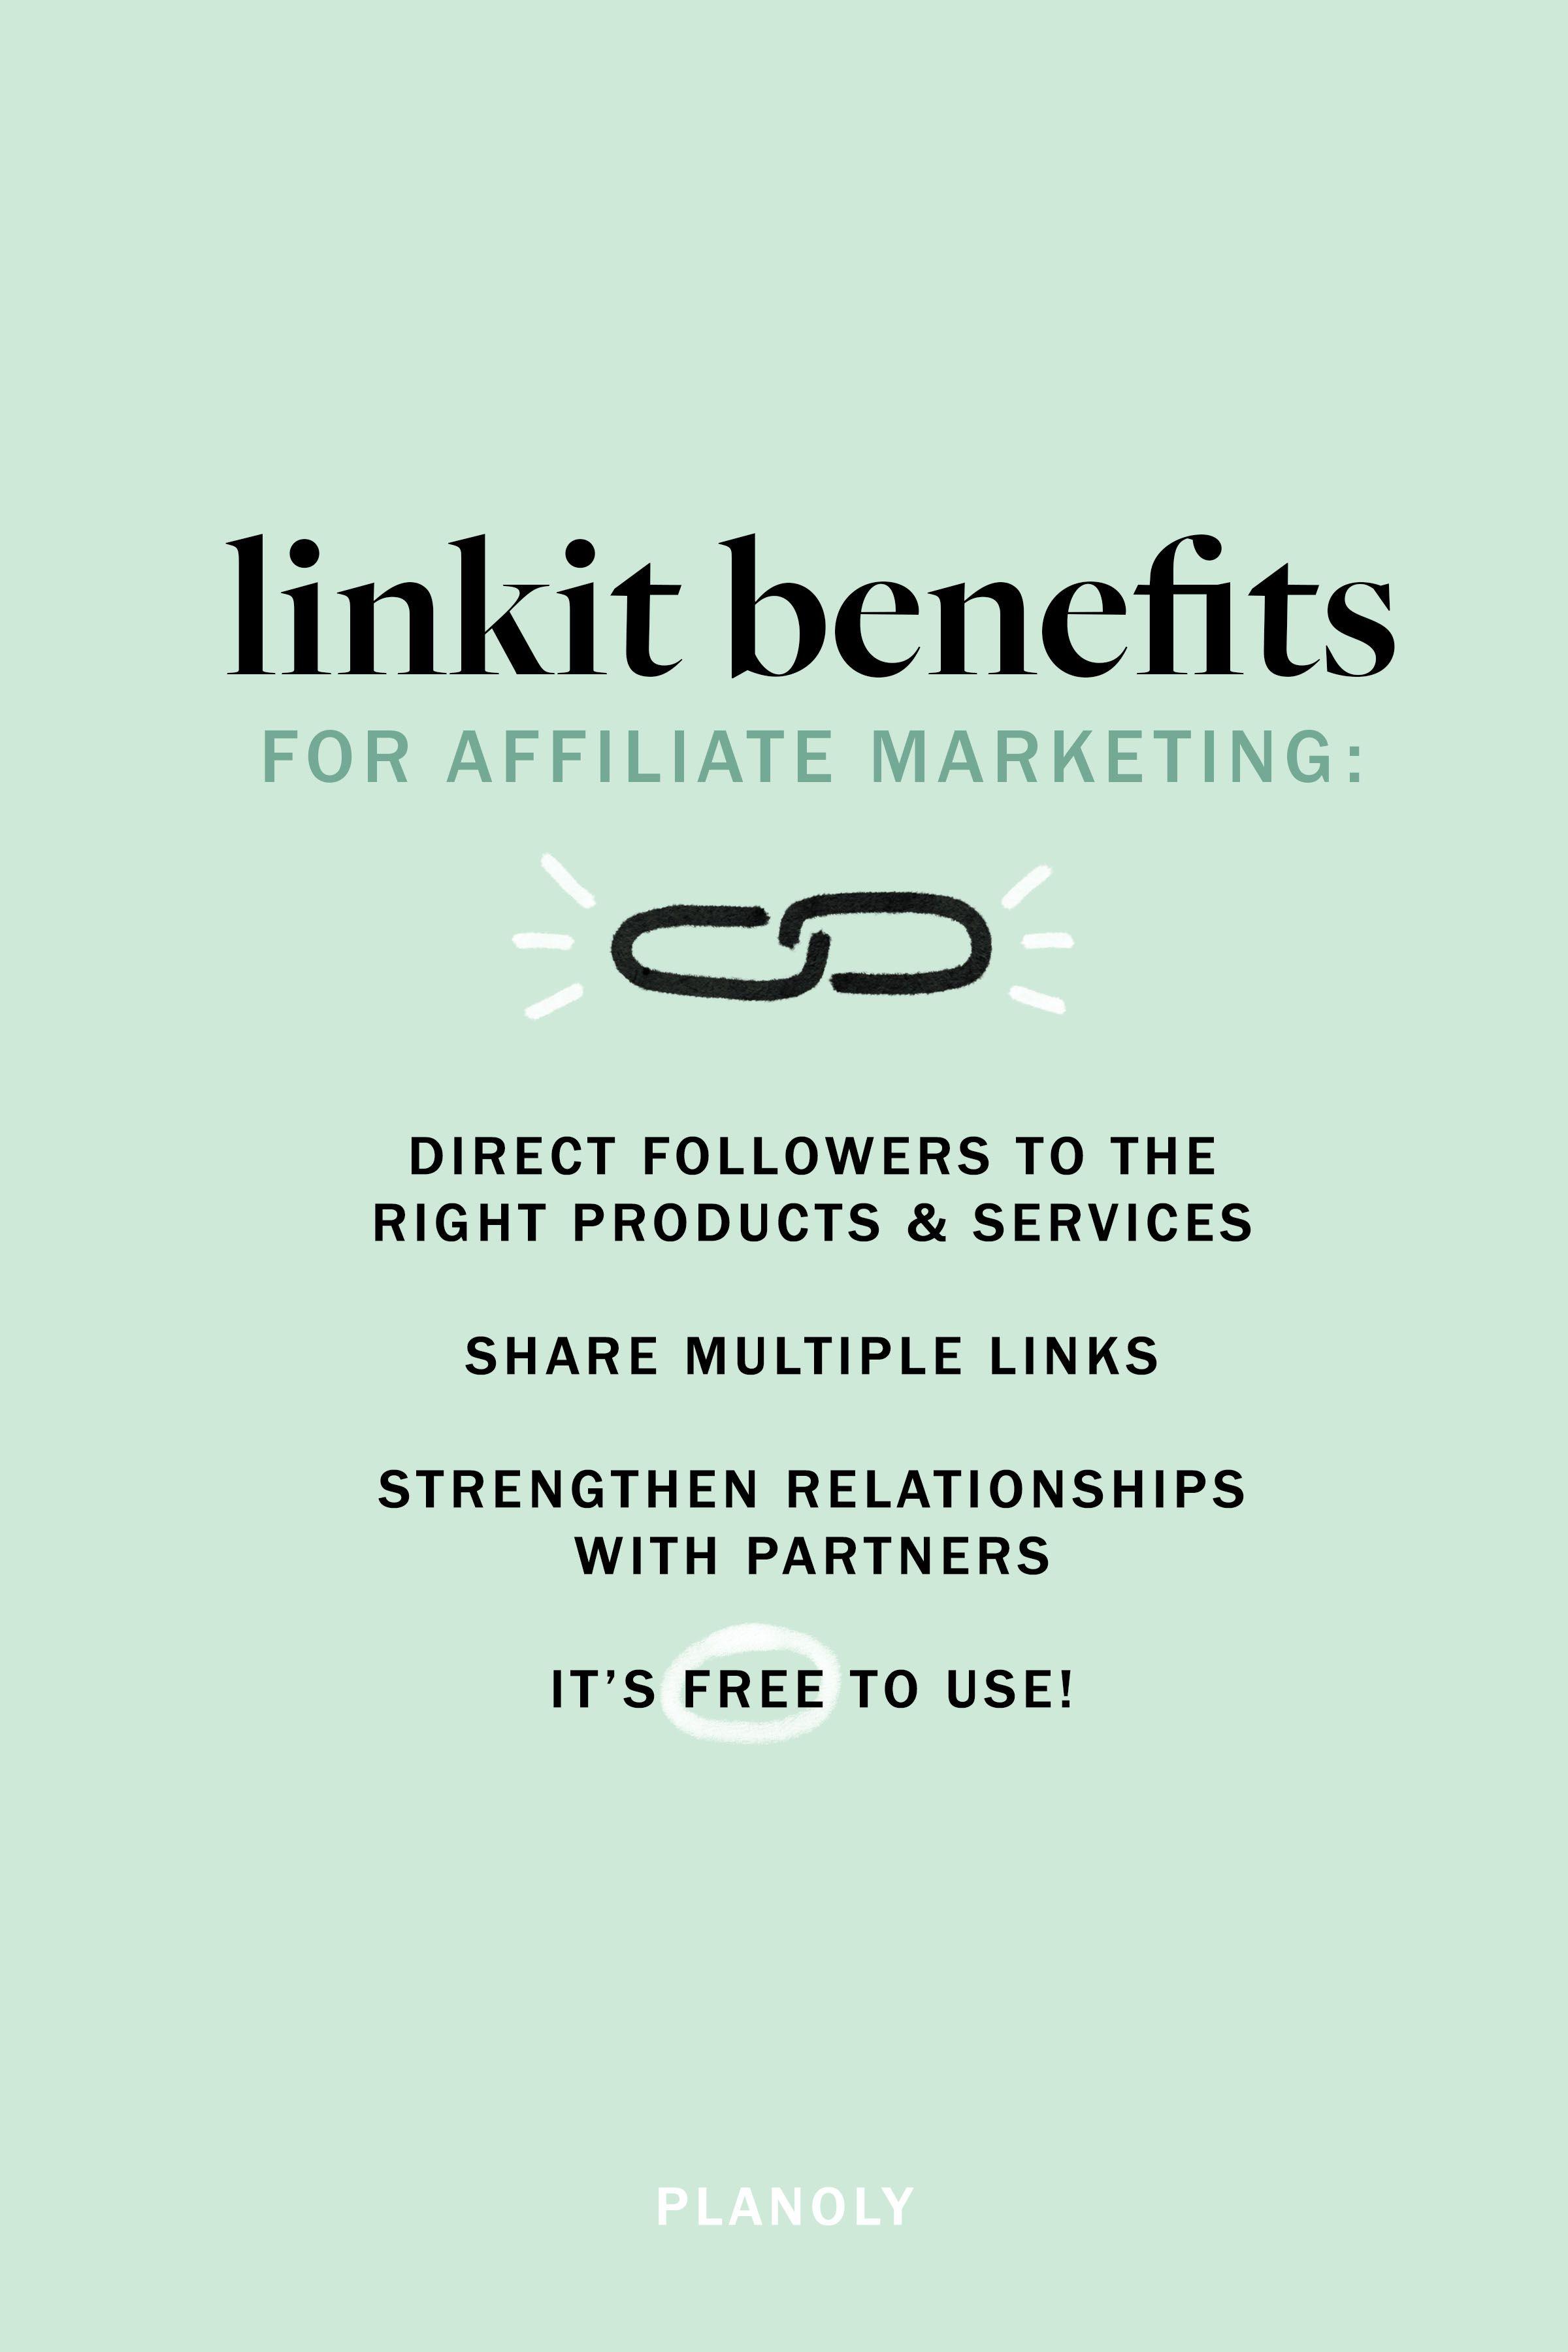 PLANOLY-Blog Post-Affiliate Marketing Benefits-Image3